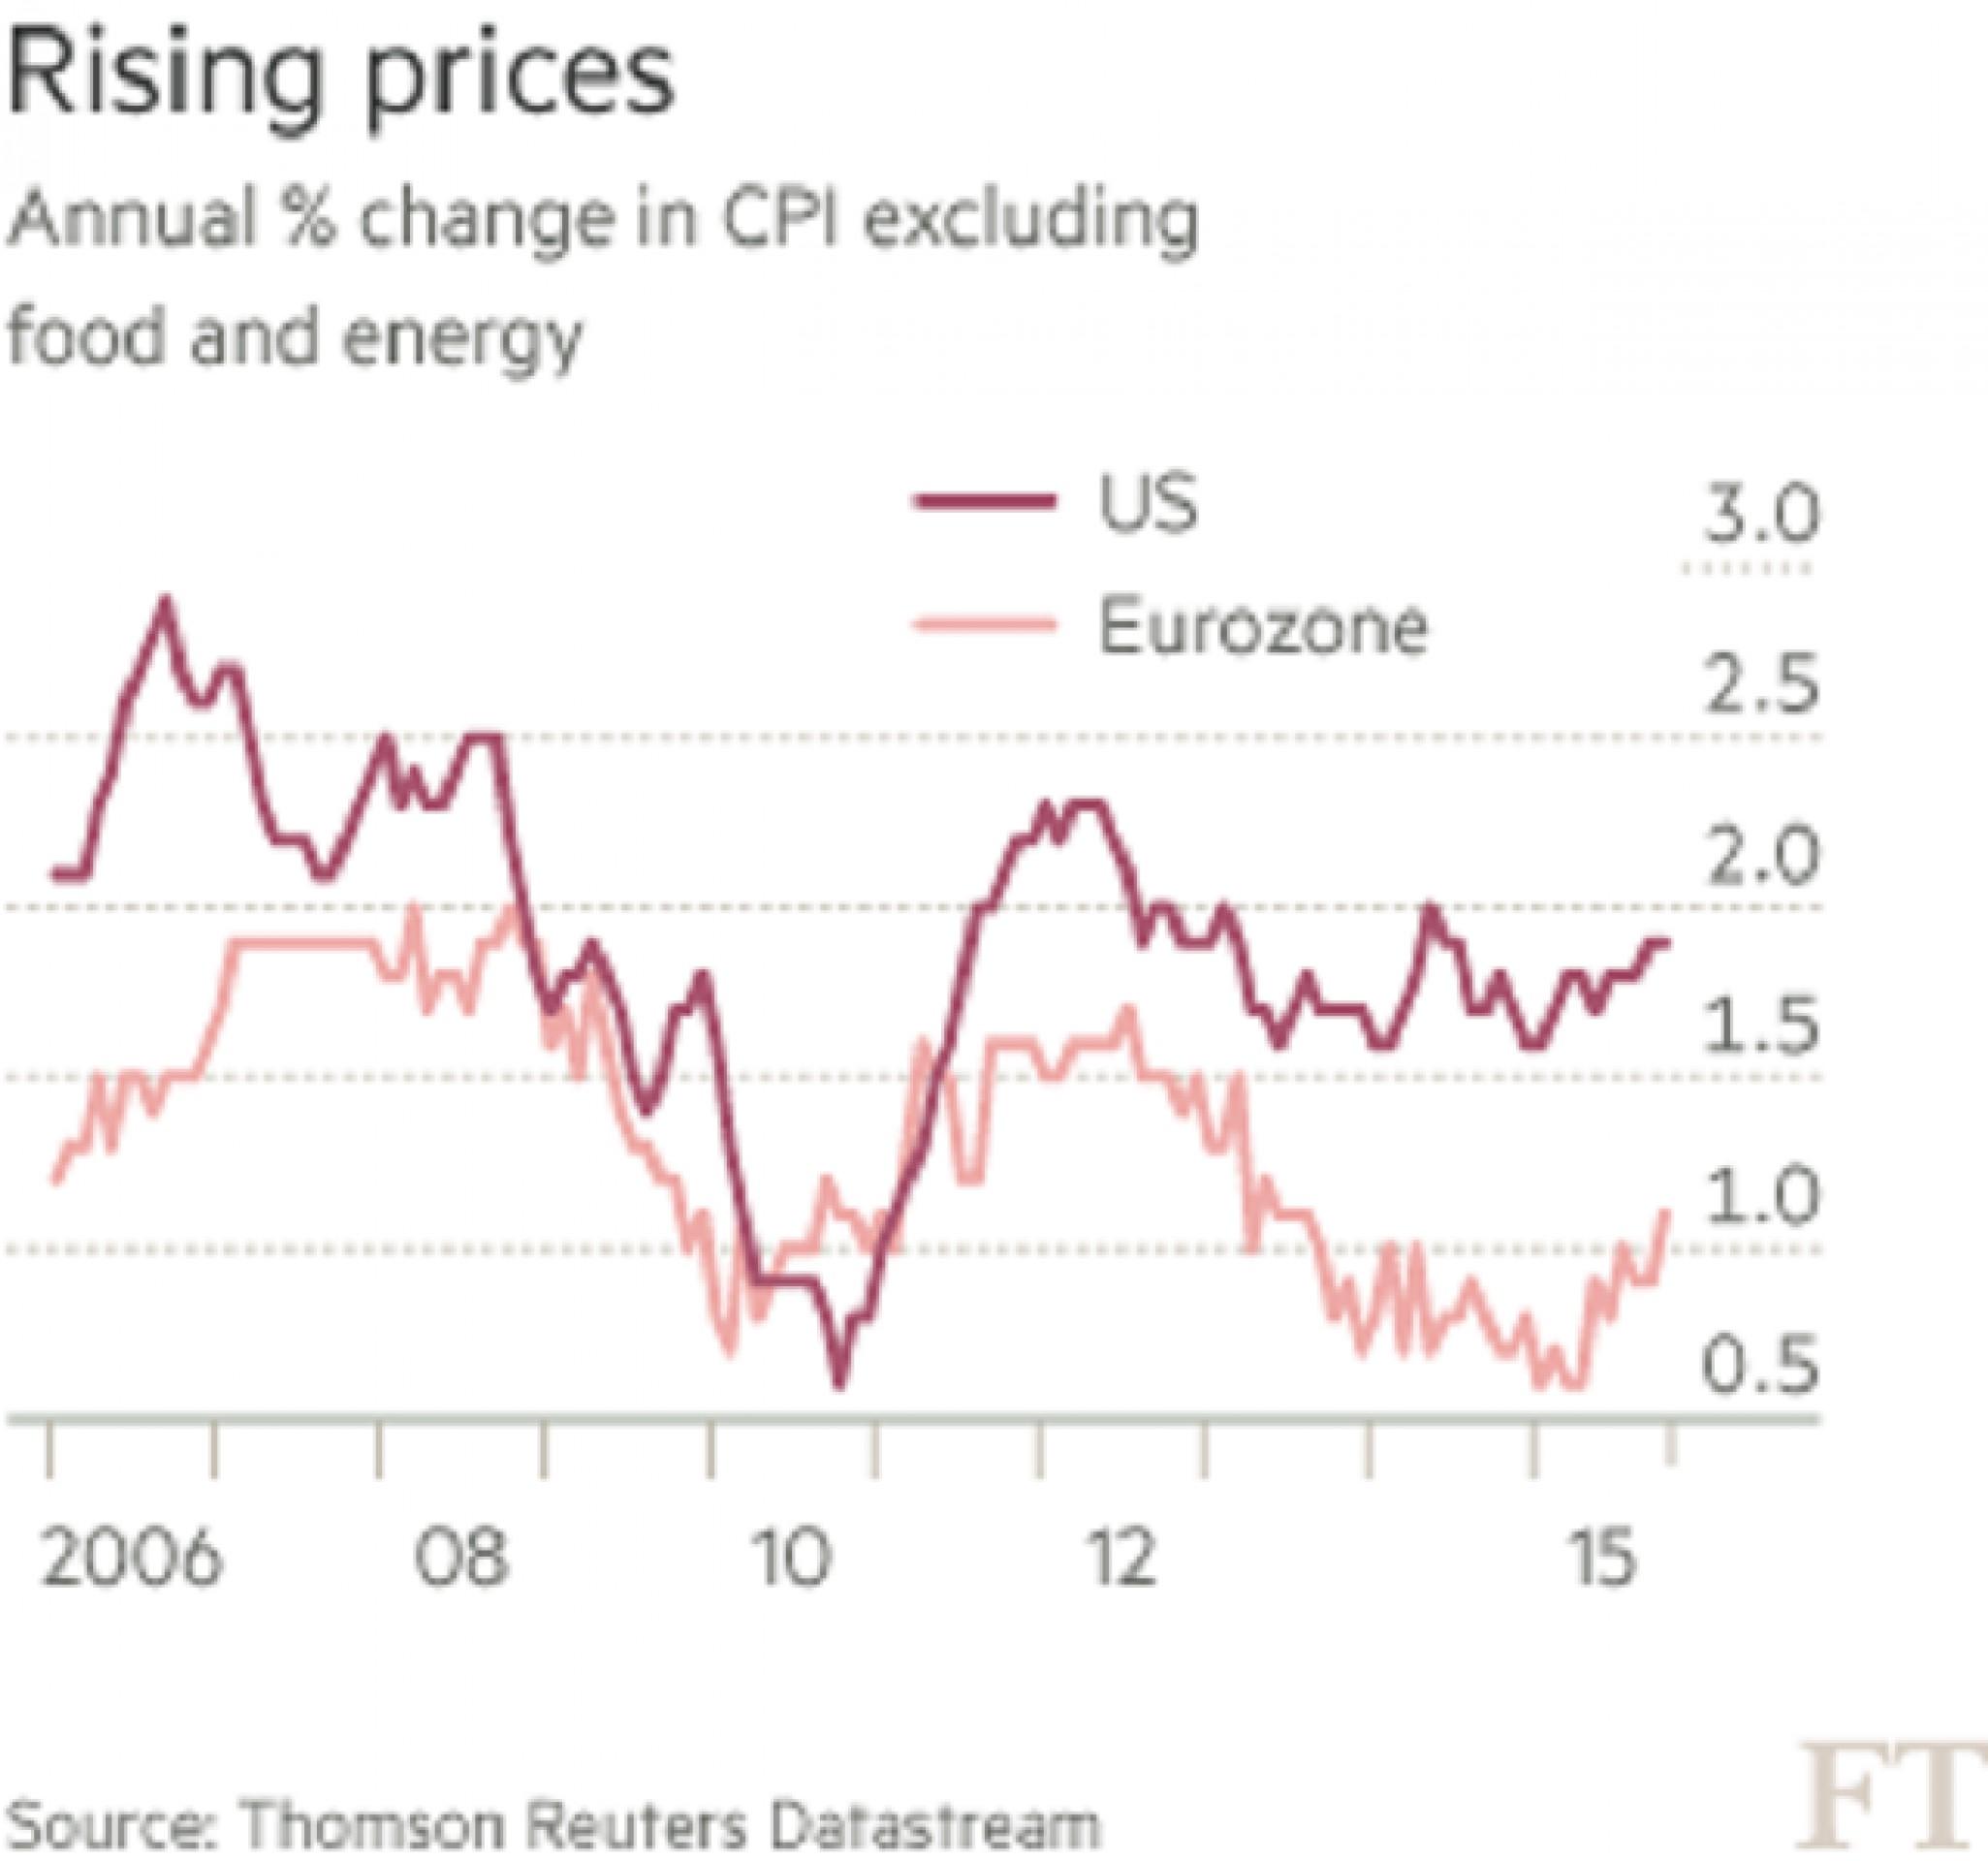 ЕЦБ и ФРС: единство противоположностей